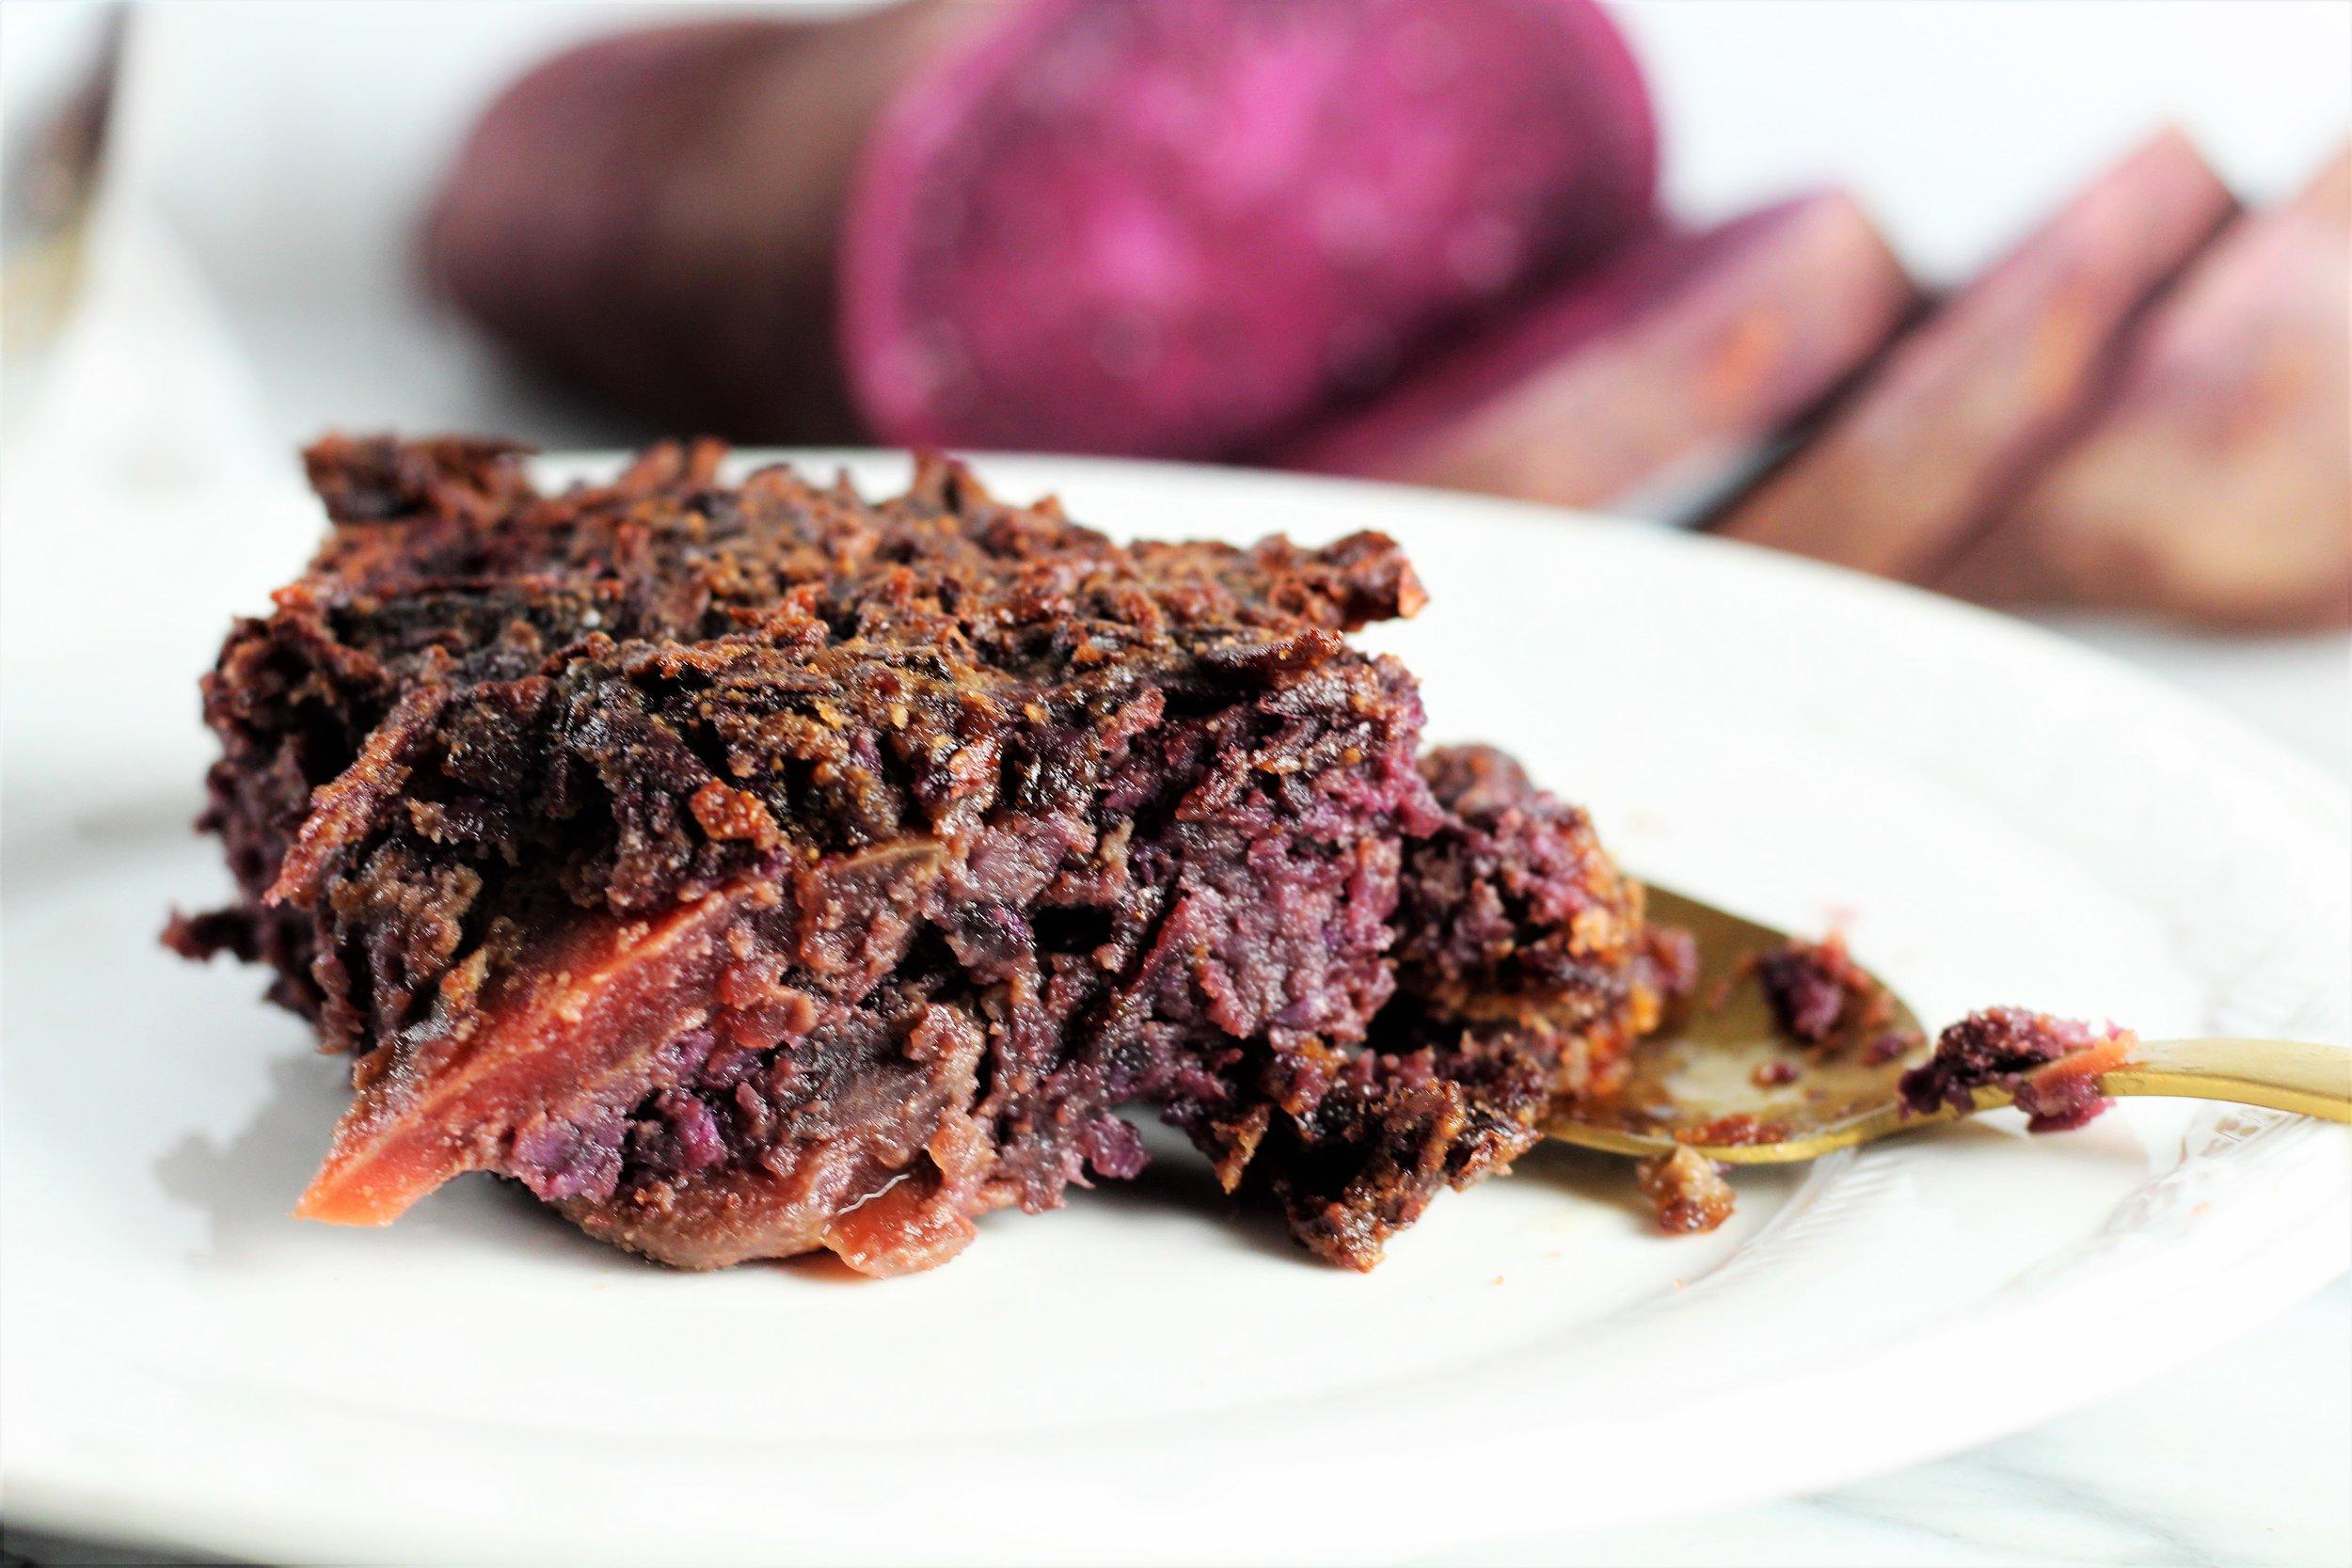 Roasted Purple Sweet Potato and Beet Souffle